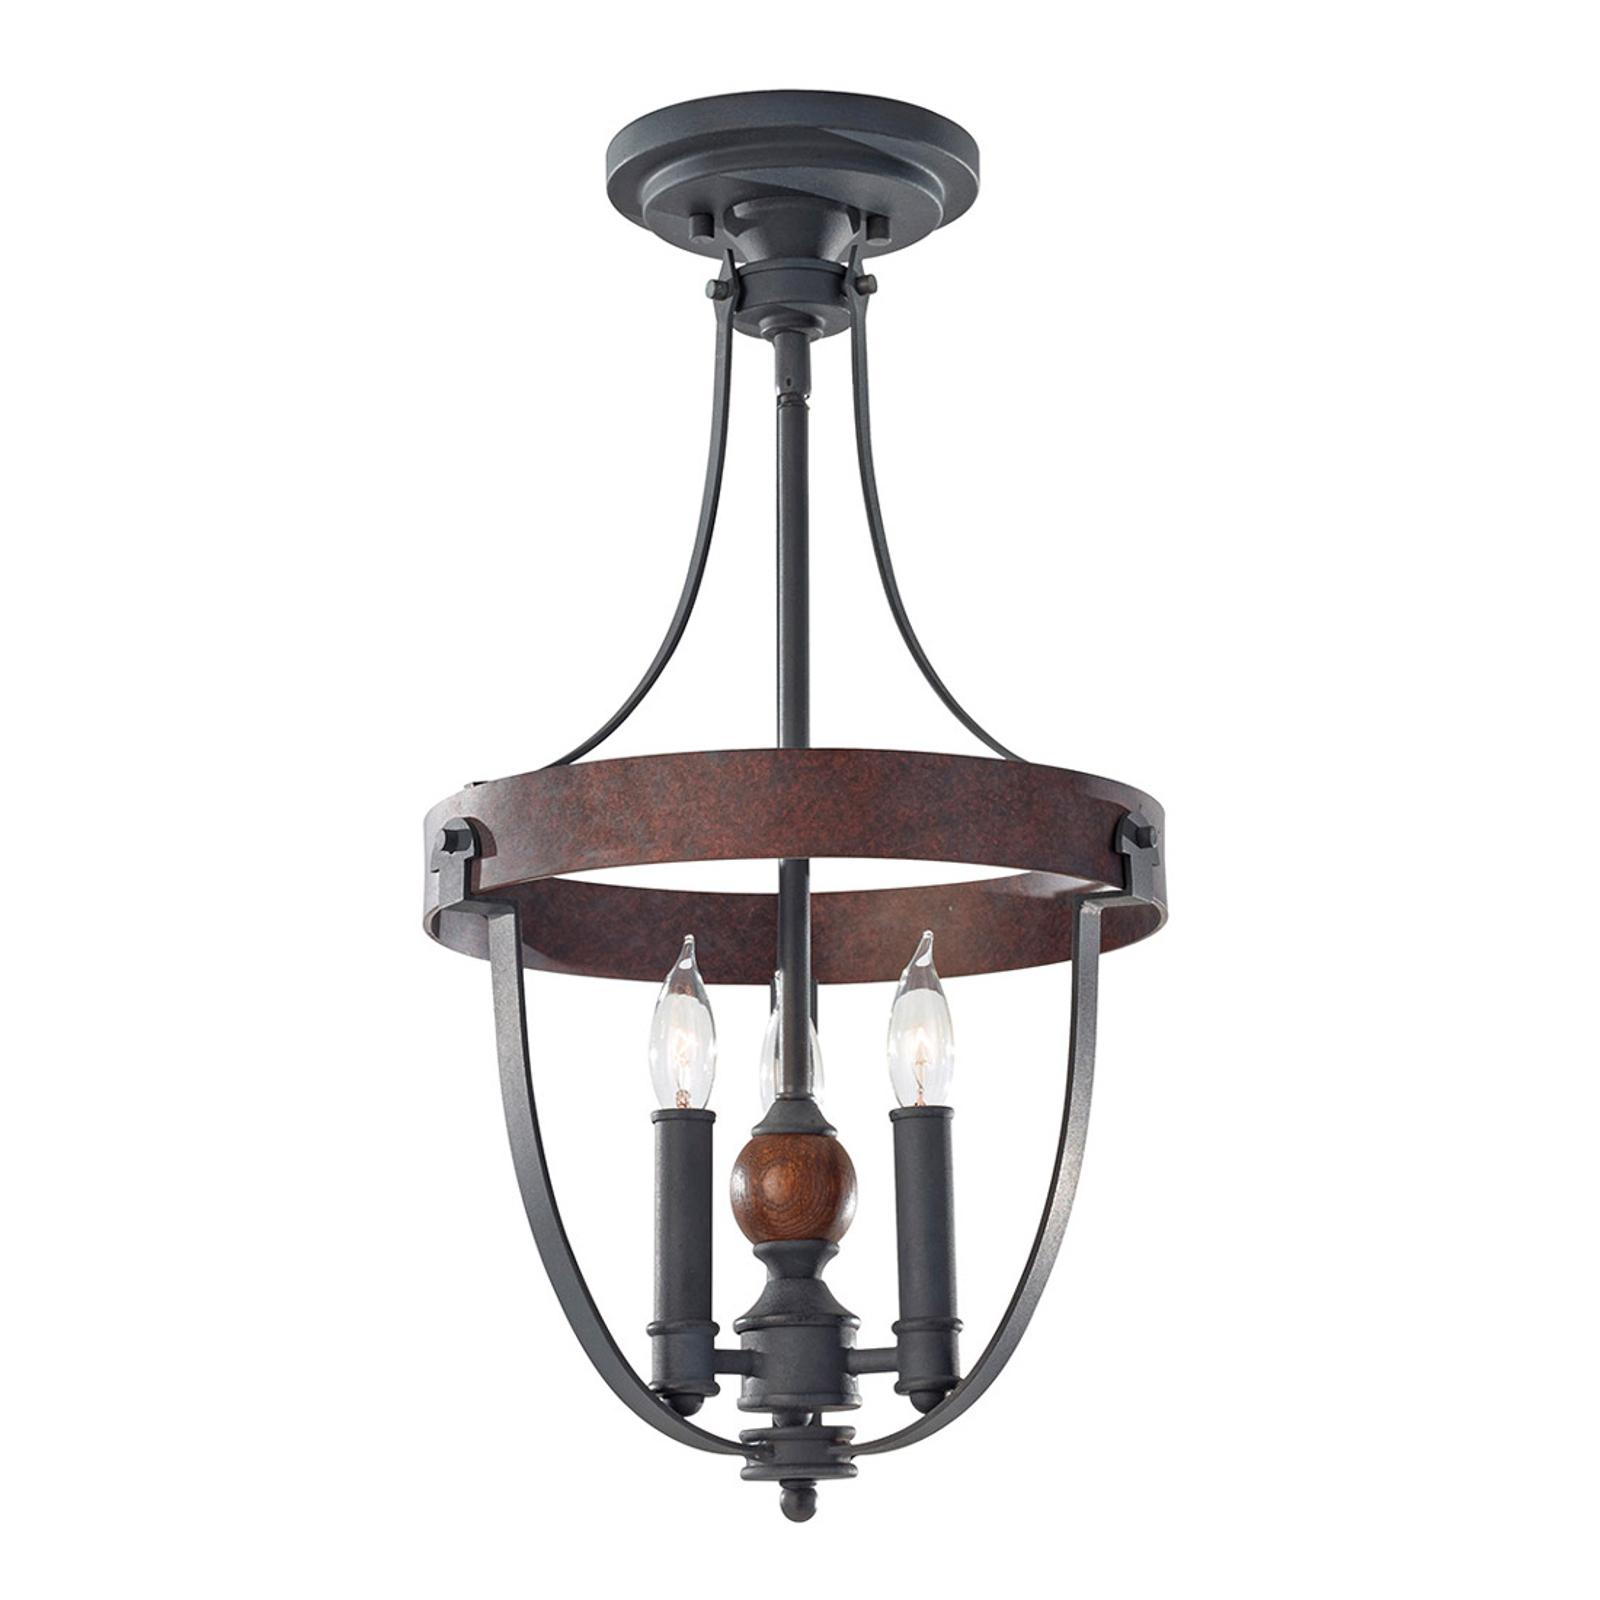 Alston loftlampe i countrystil